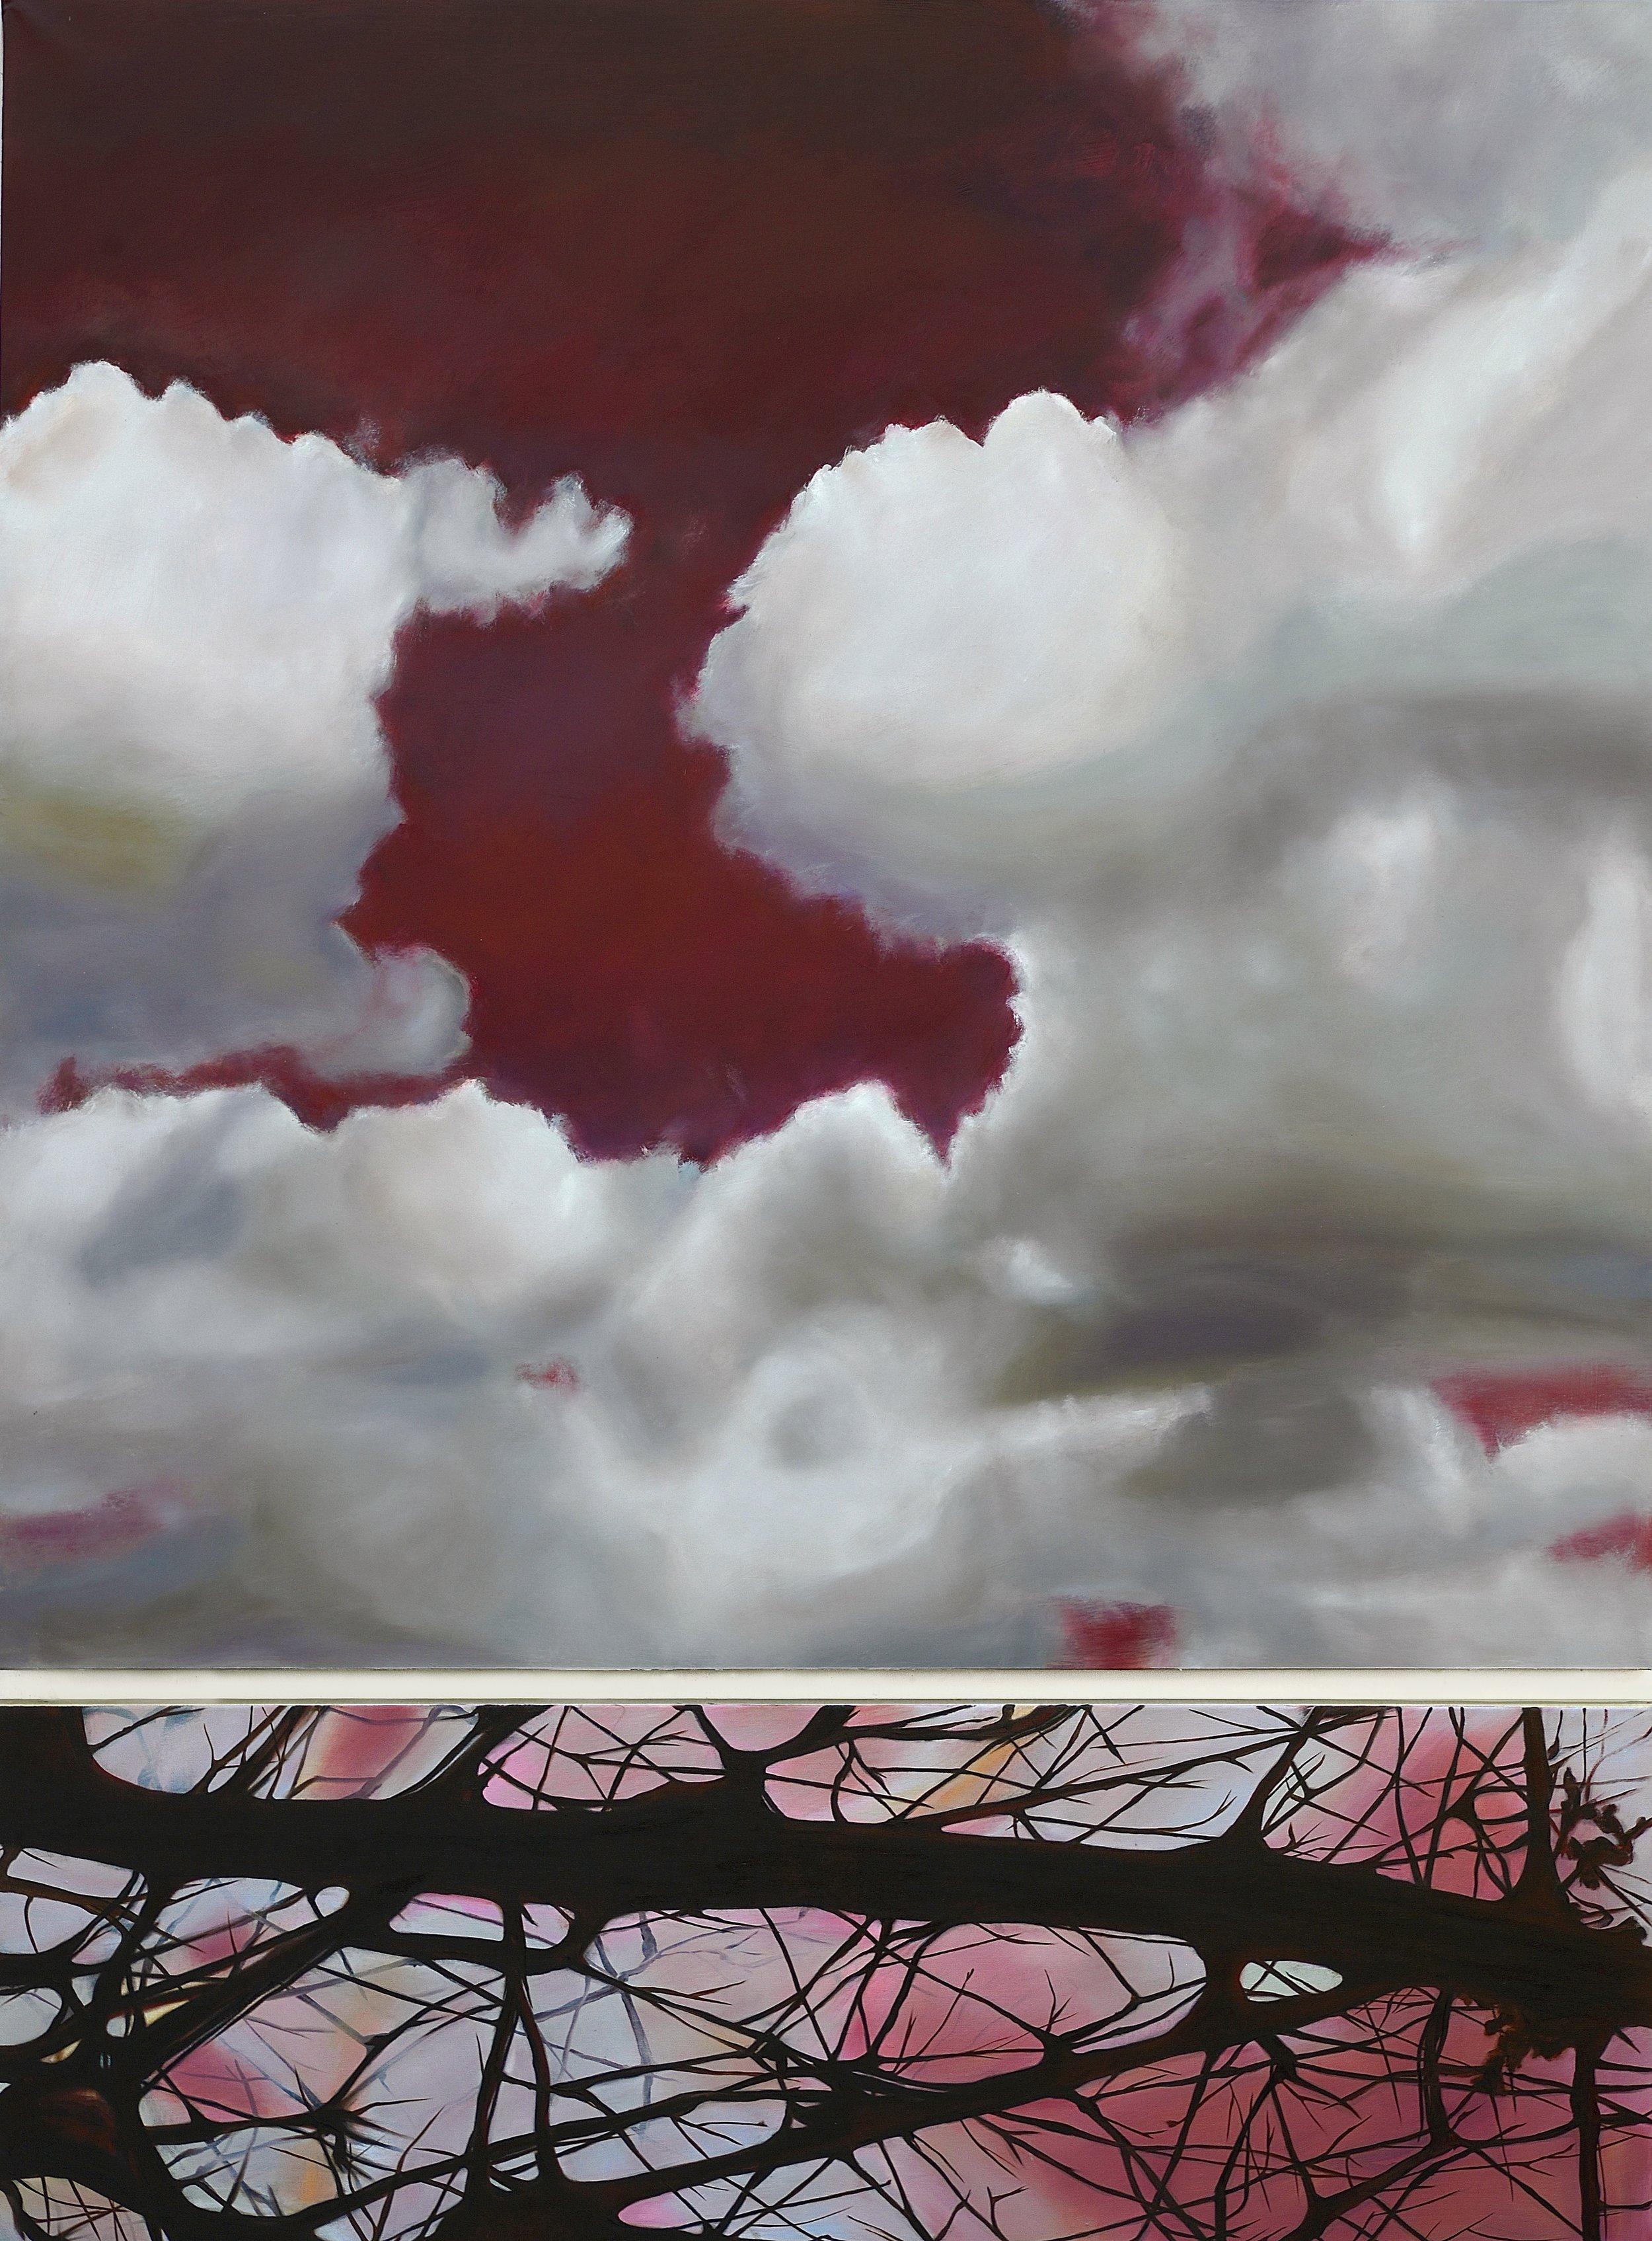 - Le Dormeur du Val, 2016oil on linen, diptych,84 x 63 in, 213 x 160 cm